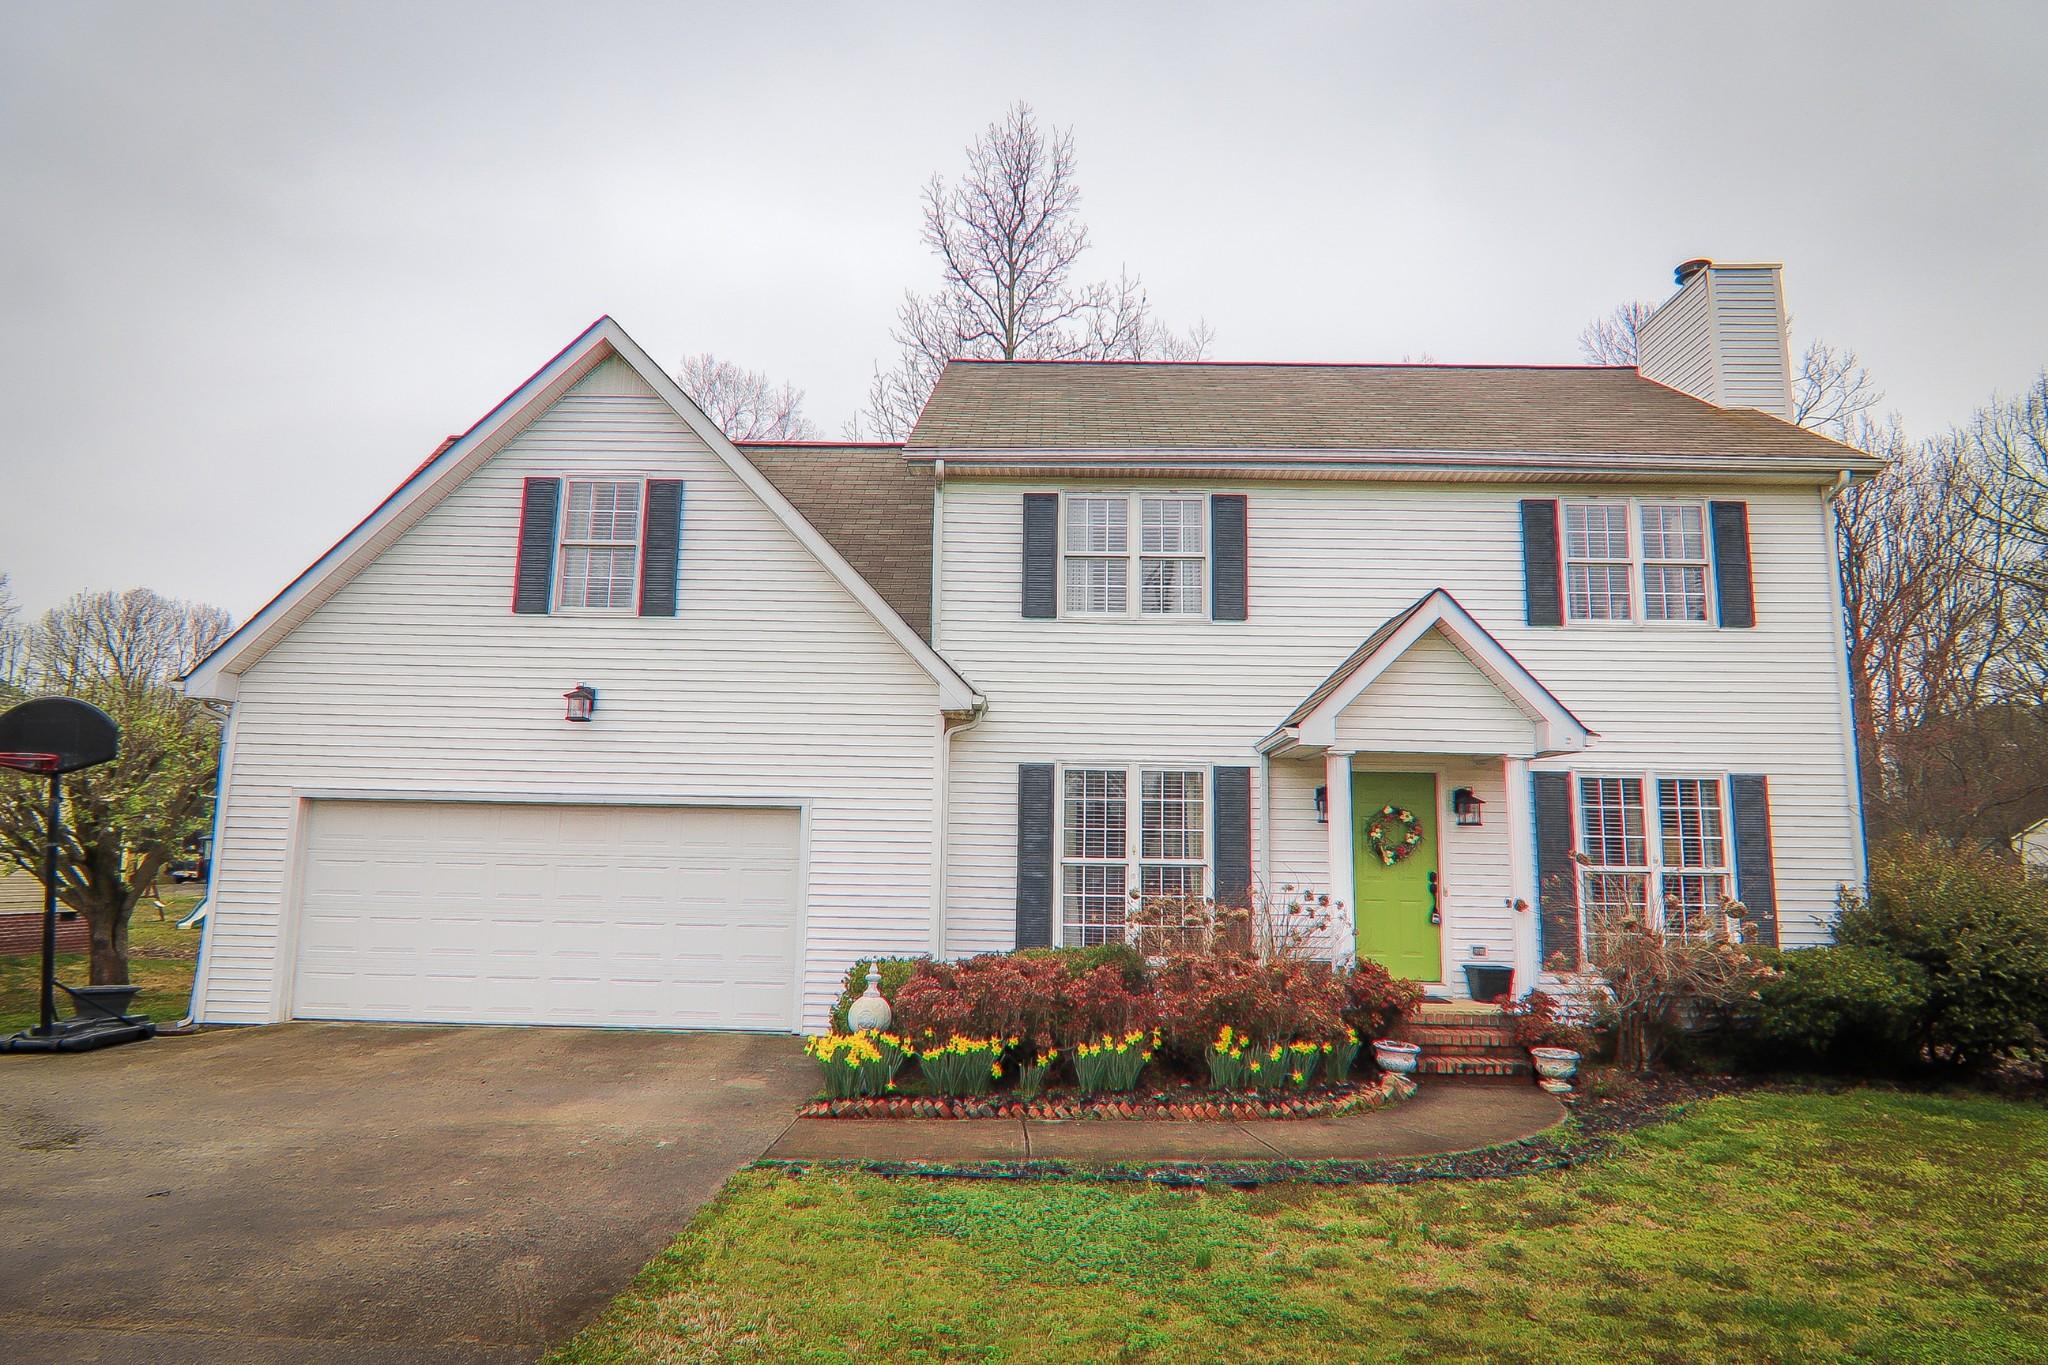 127 Jennings Cir Property Photo - Tullahoma, TN real estate listing